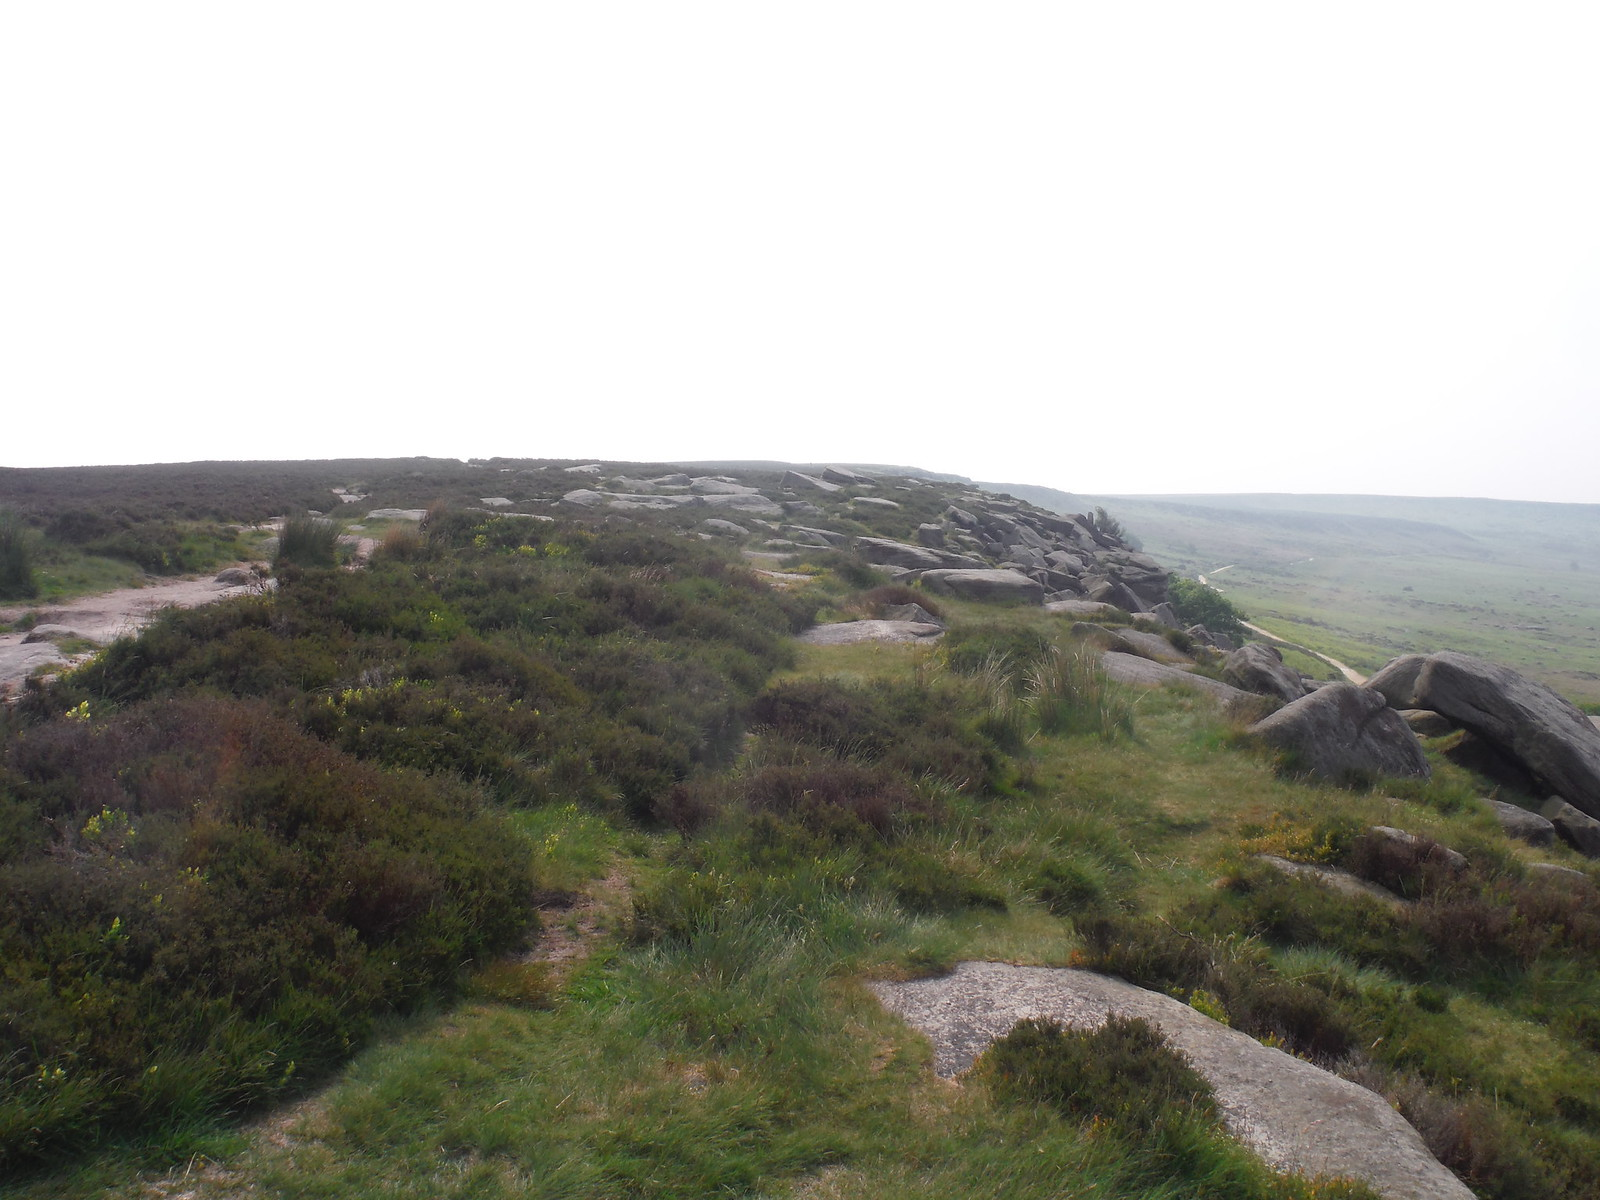 Backview along Burbage rocks SWC Walk 266 - Sheffield to Bamford (via Burbage Rocks and Stanage Edge) or to Moscar Lodge